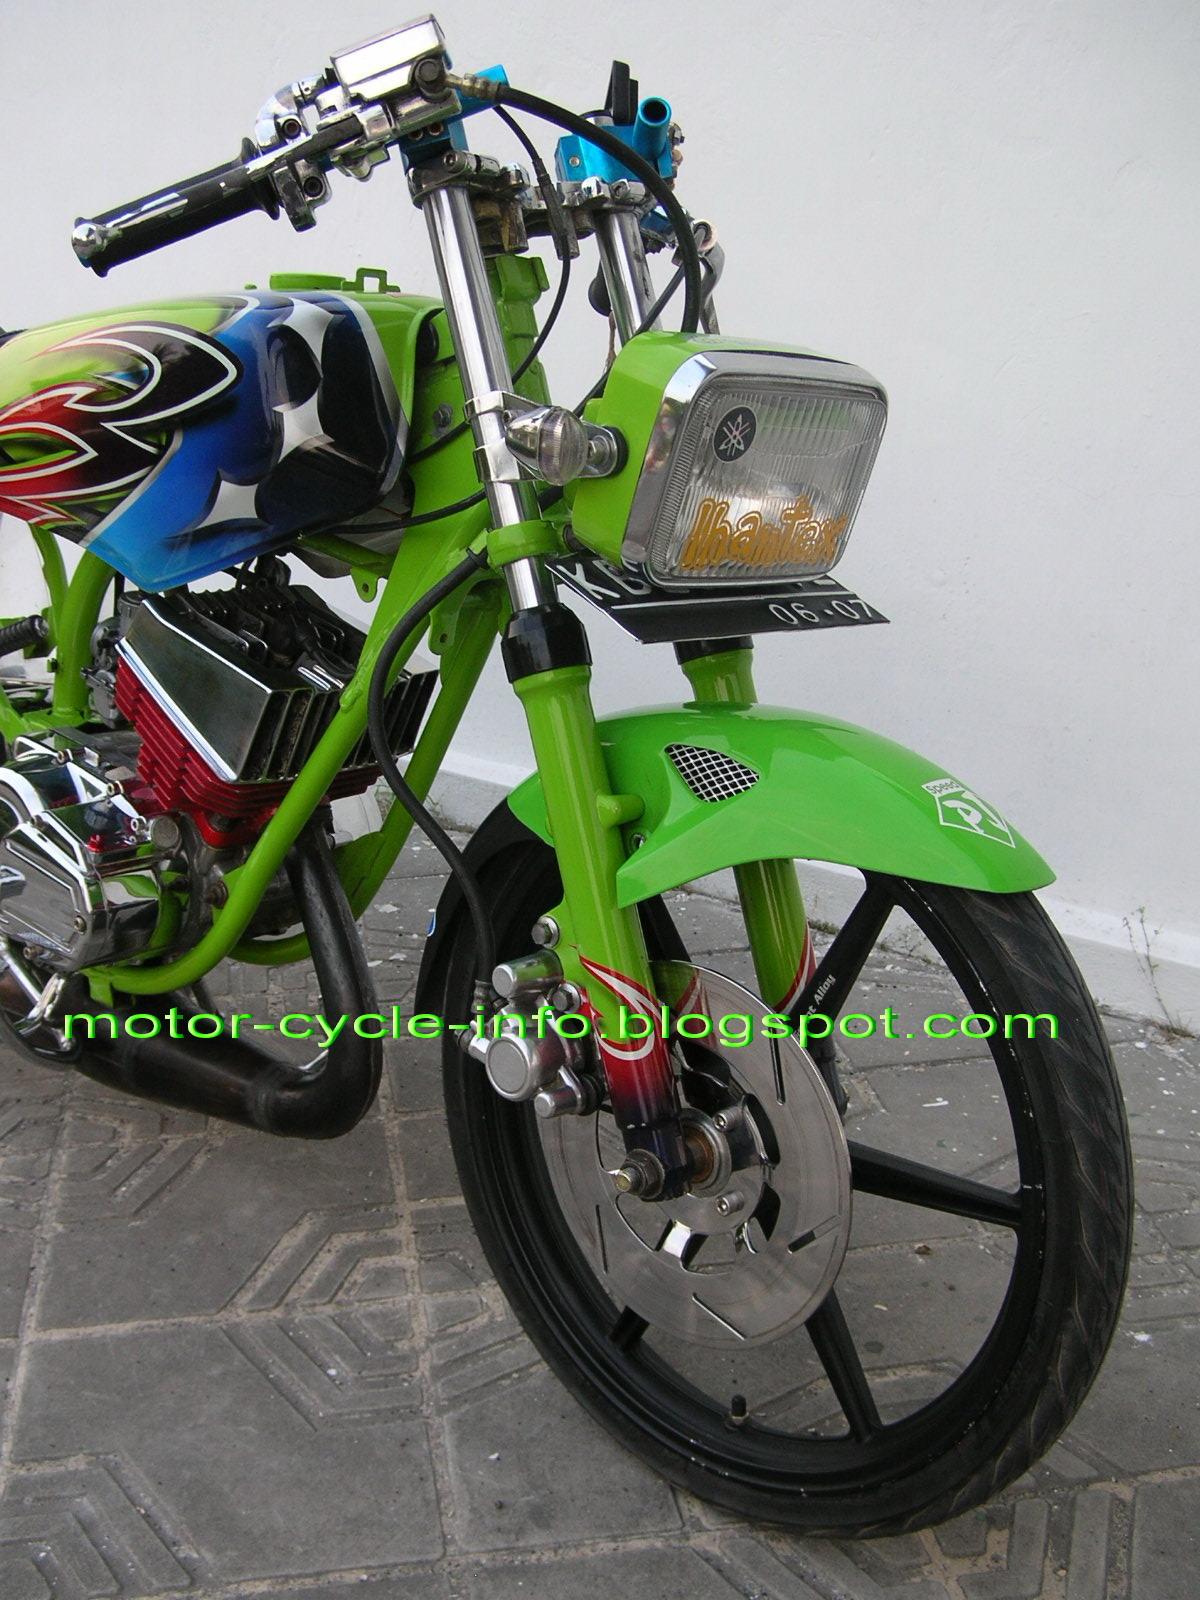 modifikasi motor rx king extreme airbrush | motor modif contest ...